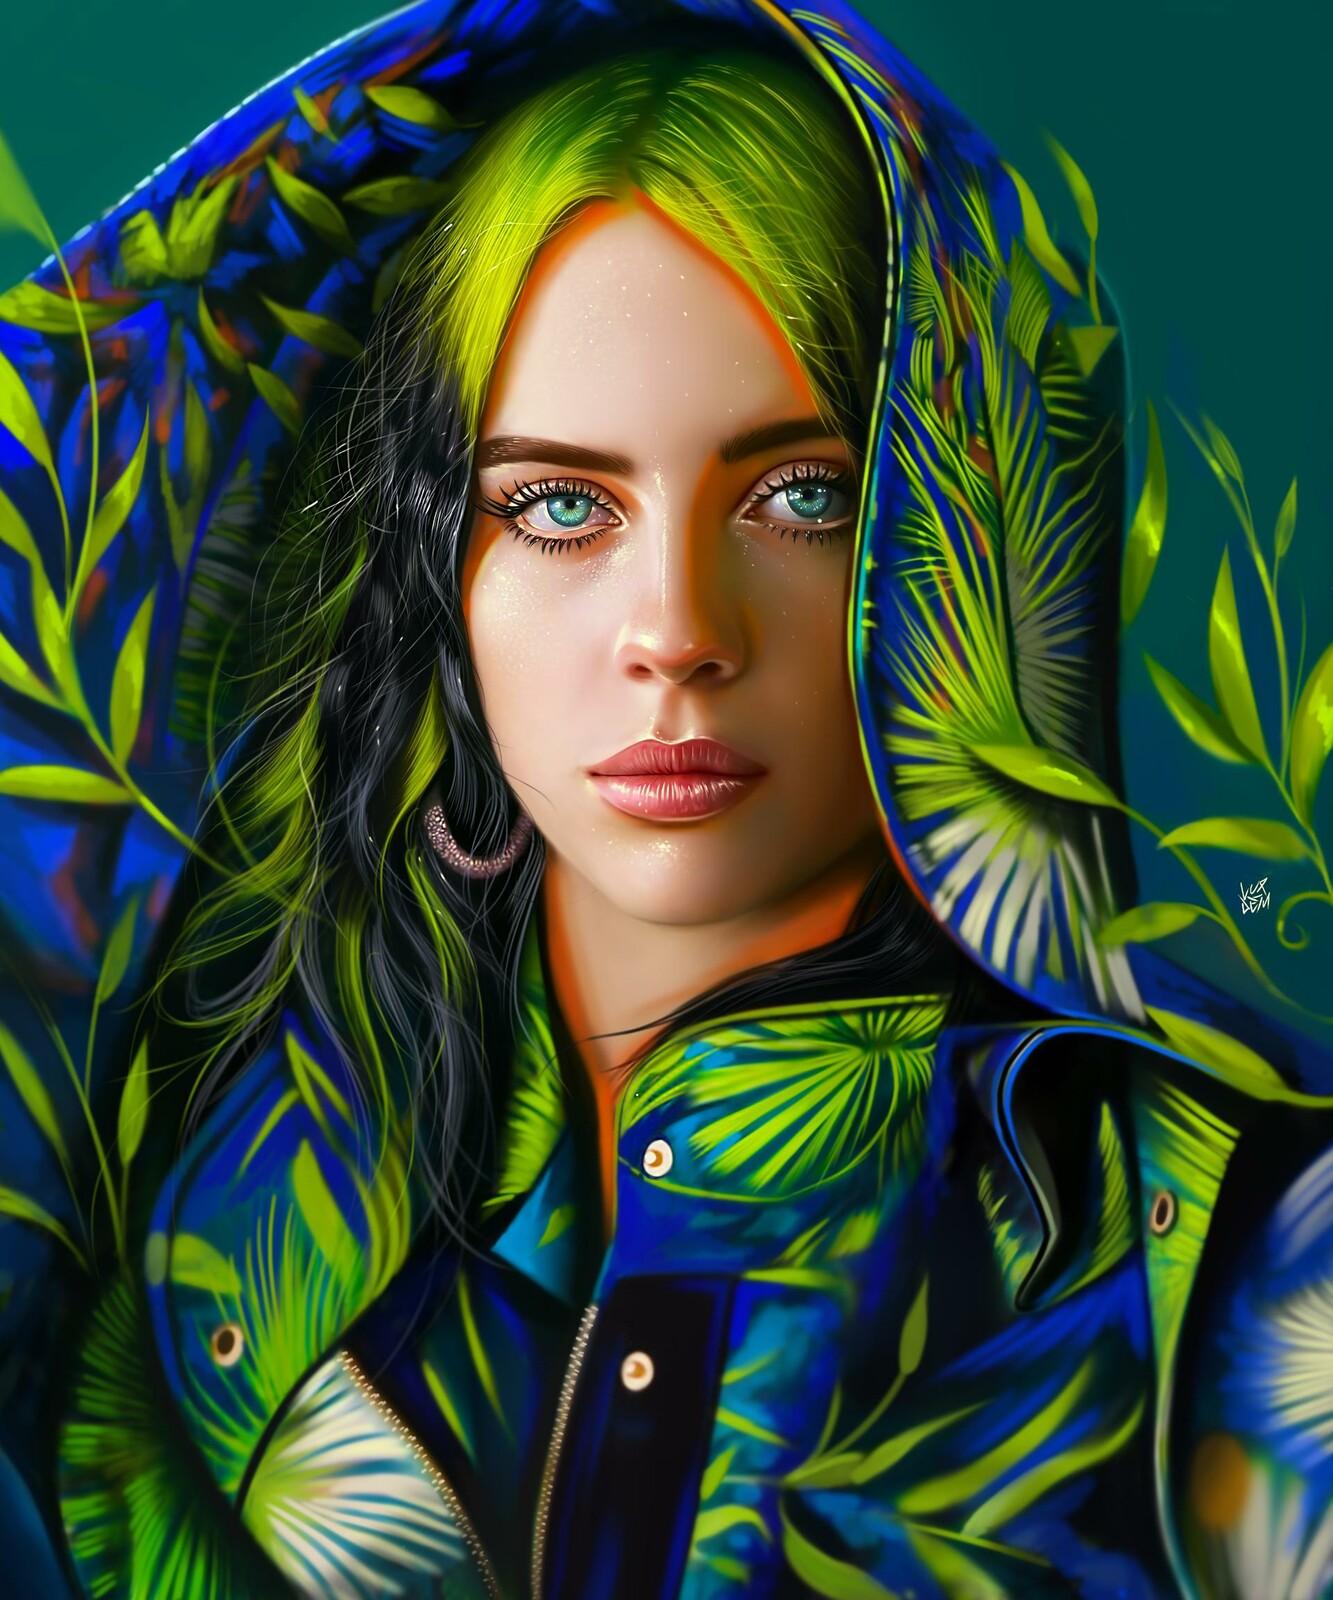 My Portrait Brushes: https://artstn.co/m/7DXp Donate me: https://artstn.co/m/XVRe